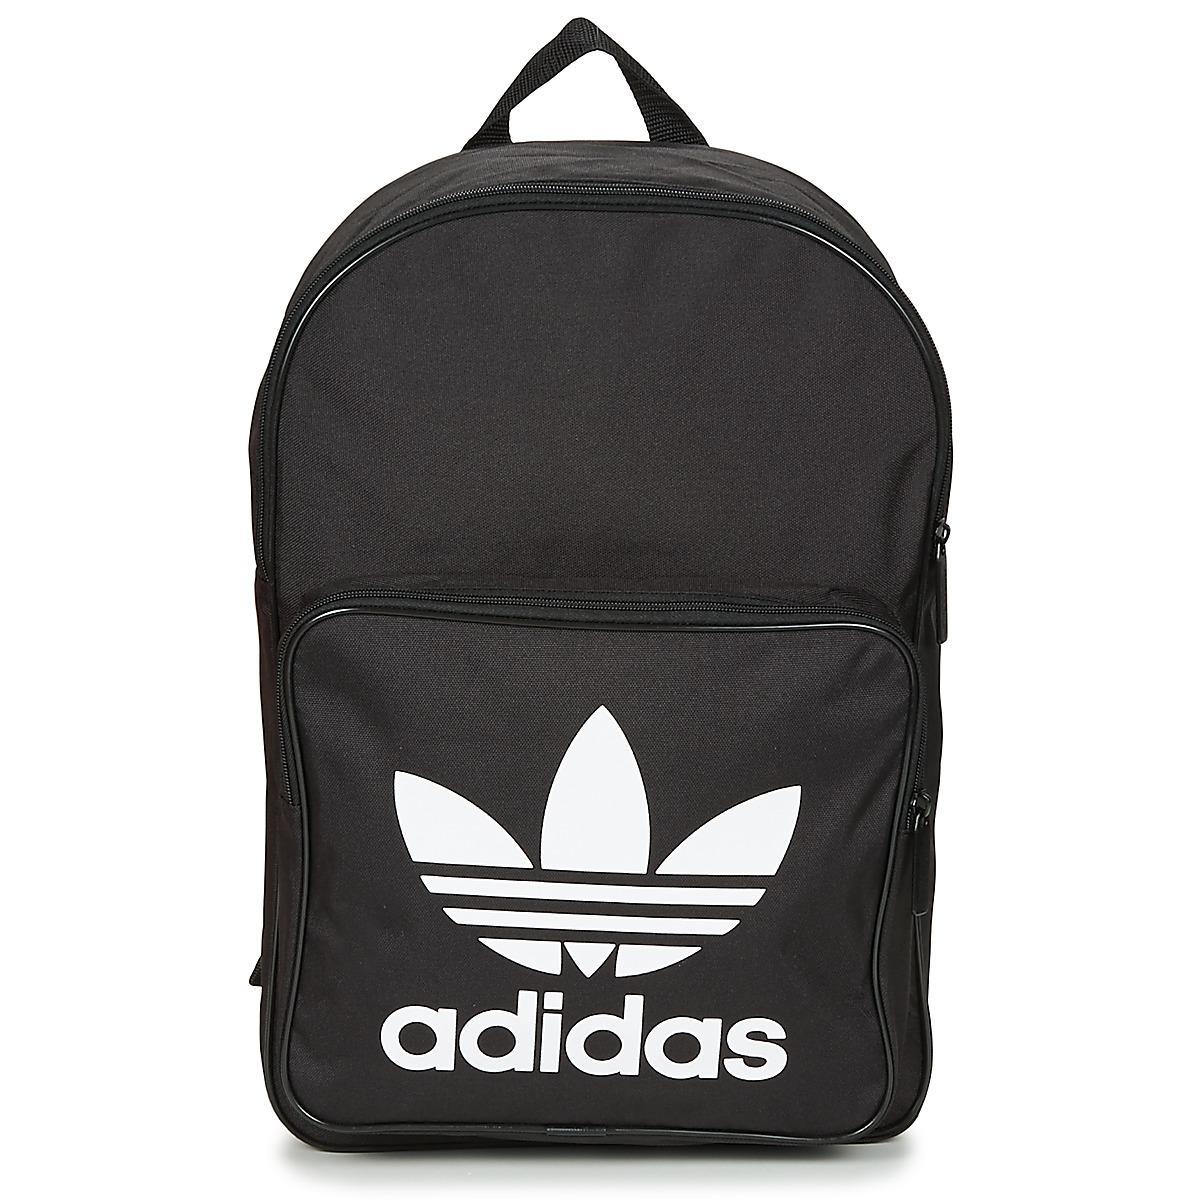 Adidas - Bp Clas Trefoil Men s Backpack In Black for Men - Lyst. View  fullscreen 0f77afd8168c0